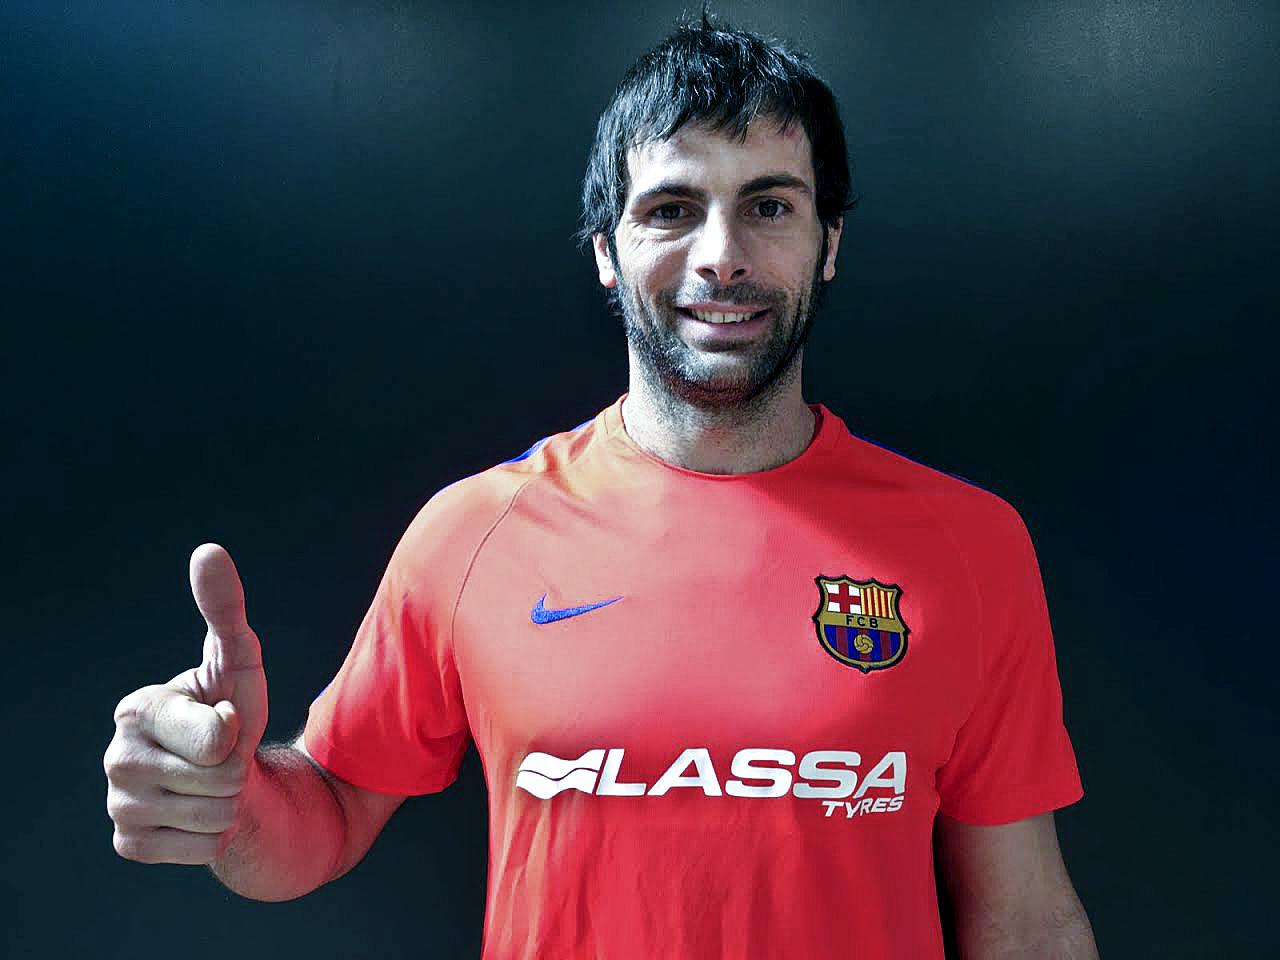 Santiago Garcés/FC Barcelona